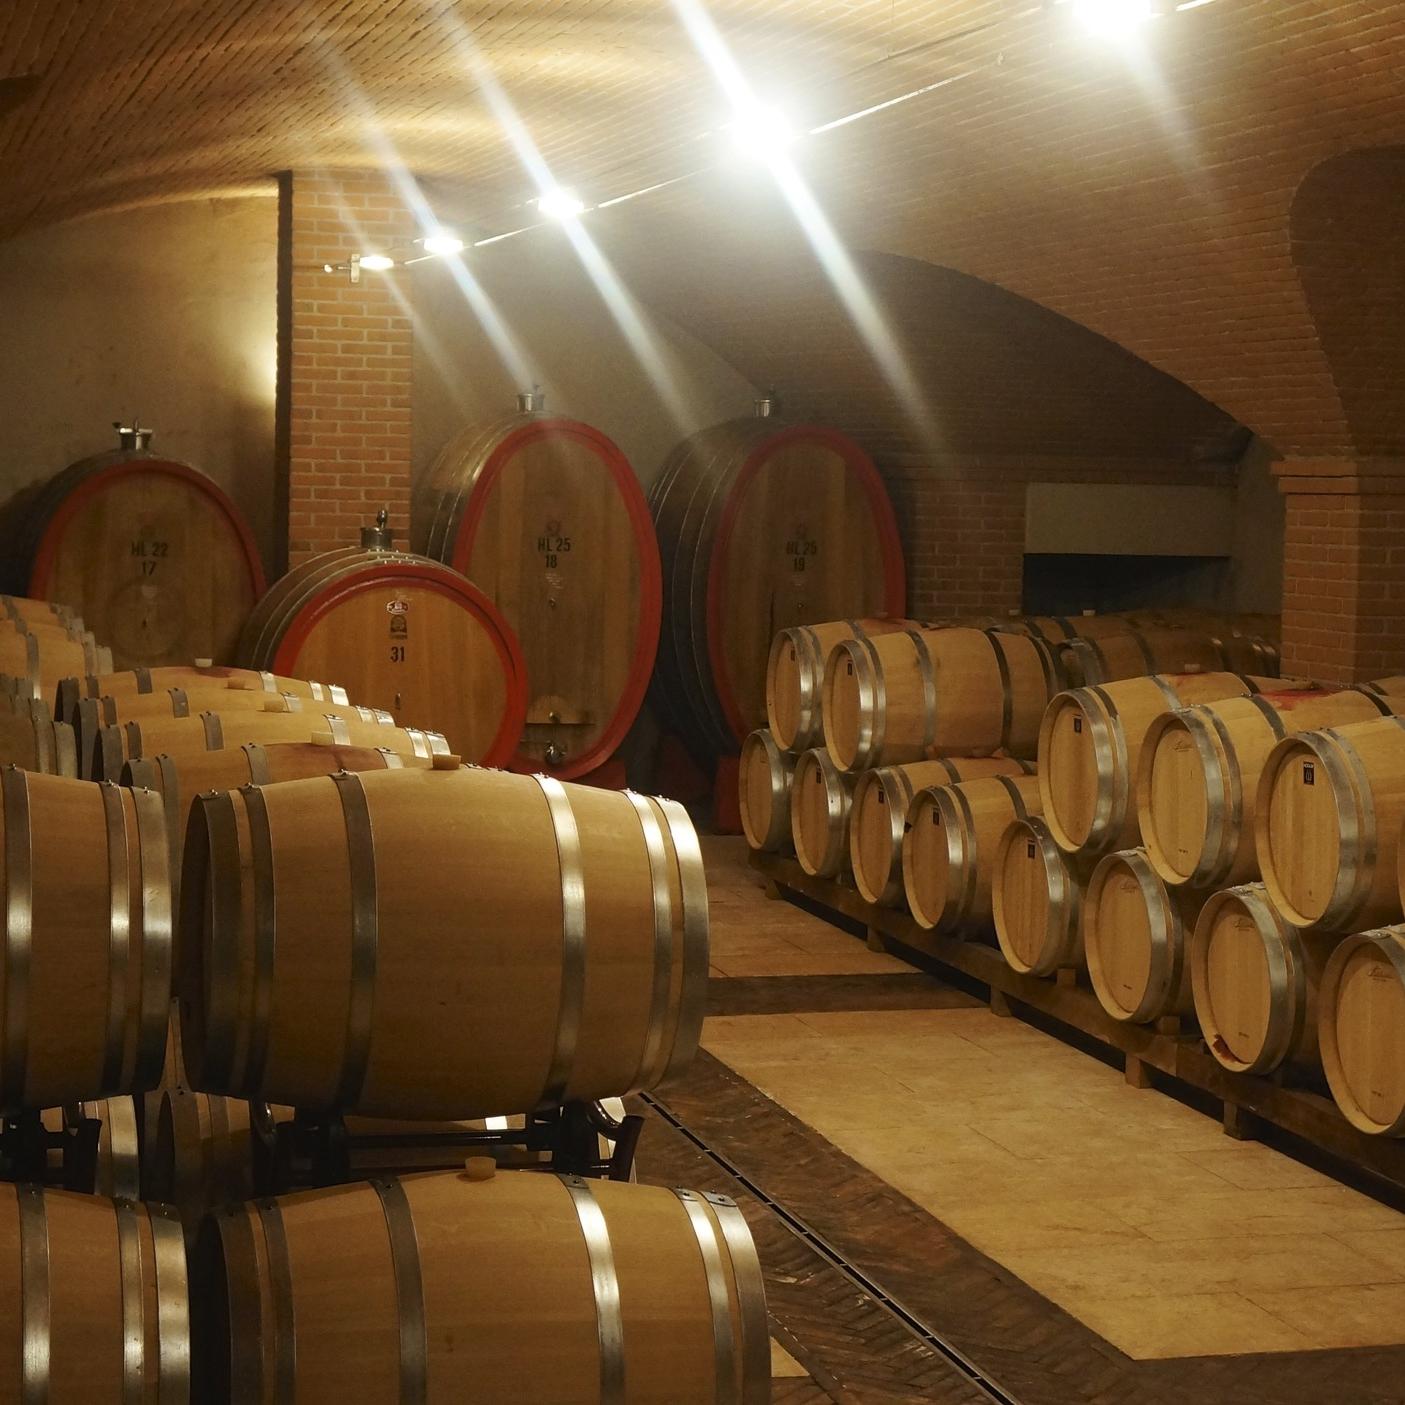 Artisanal wineries